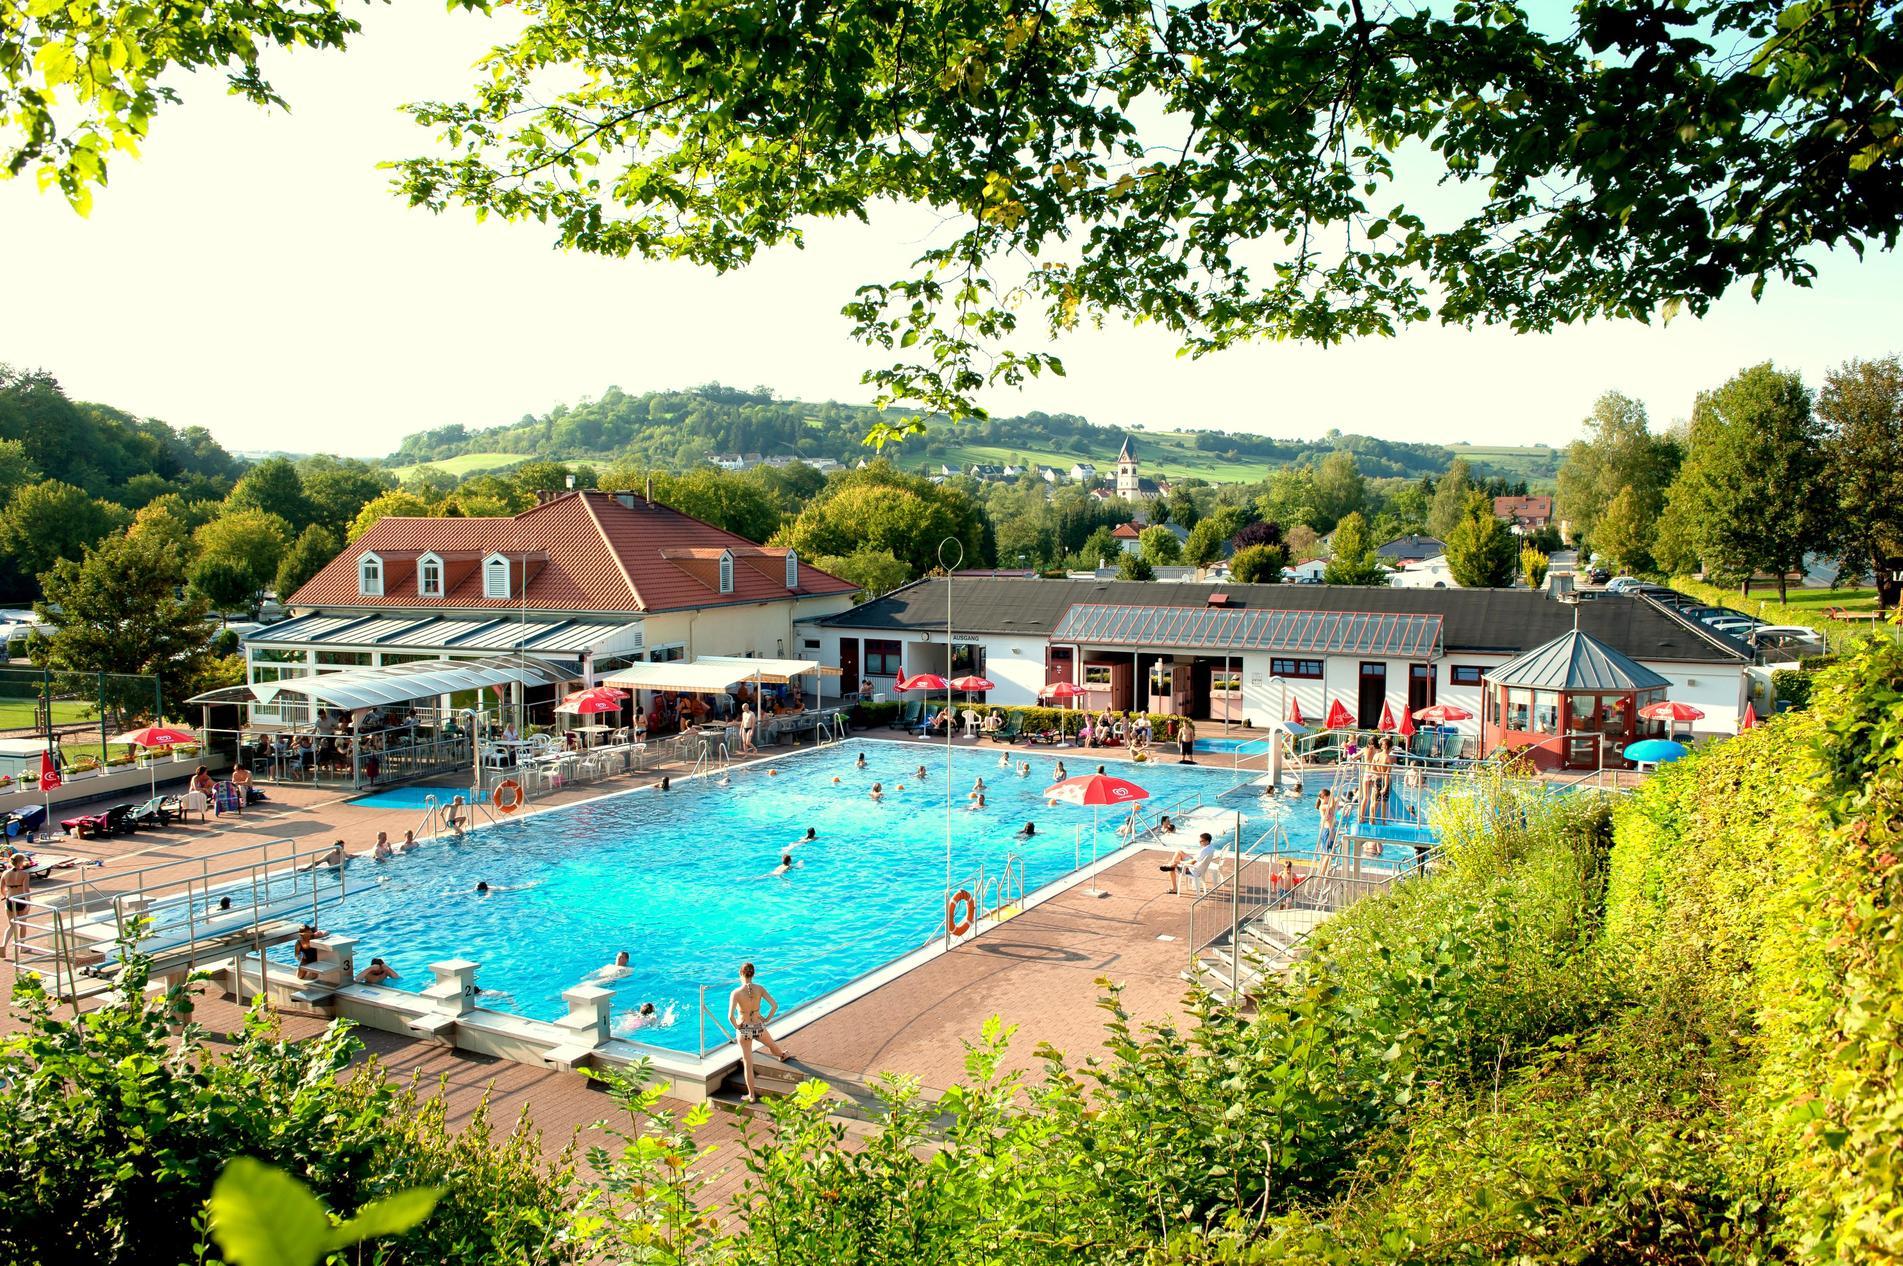 Duitsland-Oberweis-PrumtalCamping%20Oberweis-ExtraLarge Campings Duitsland